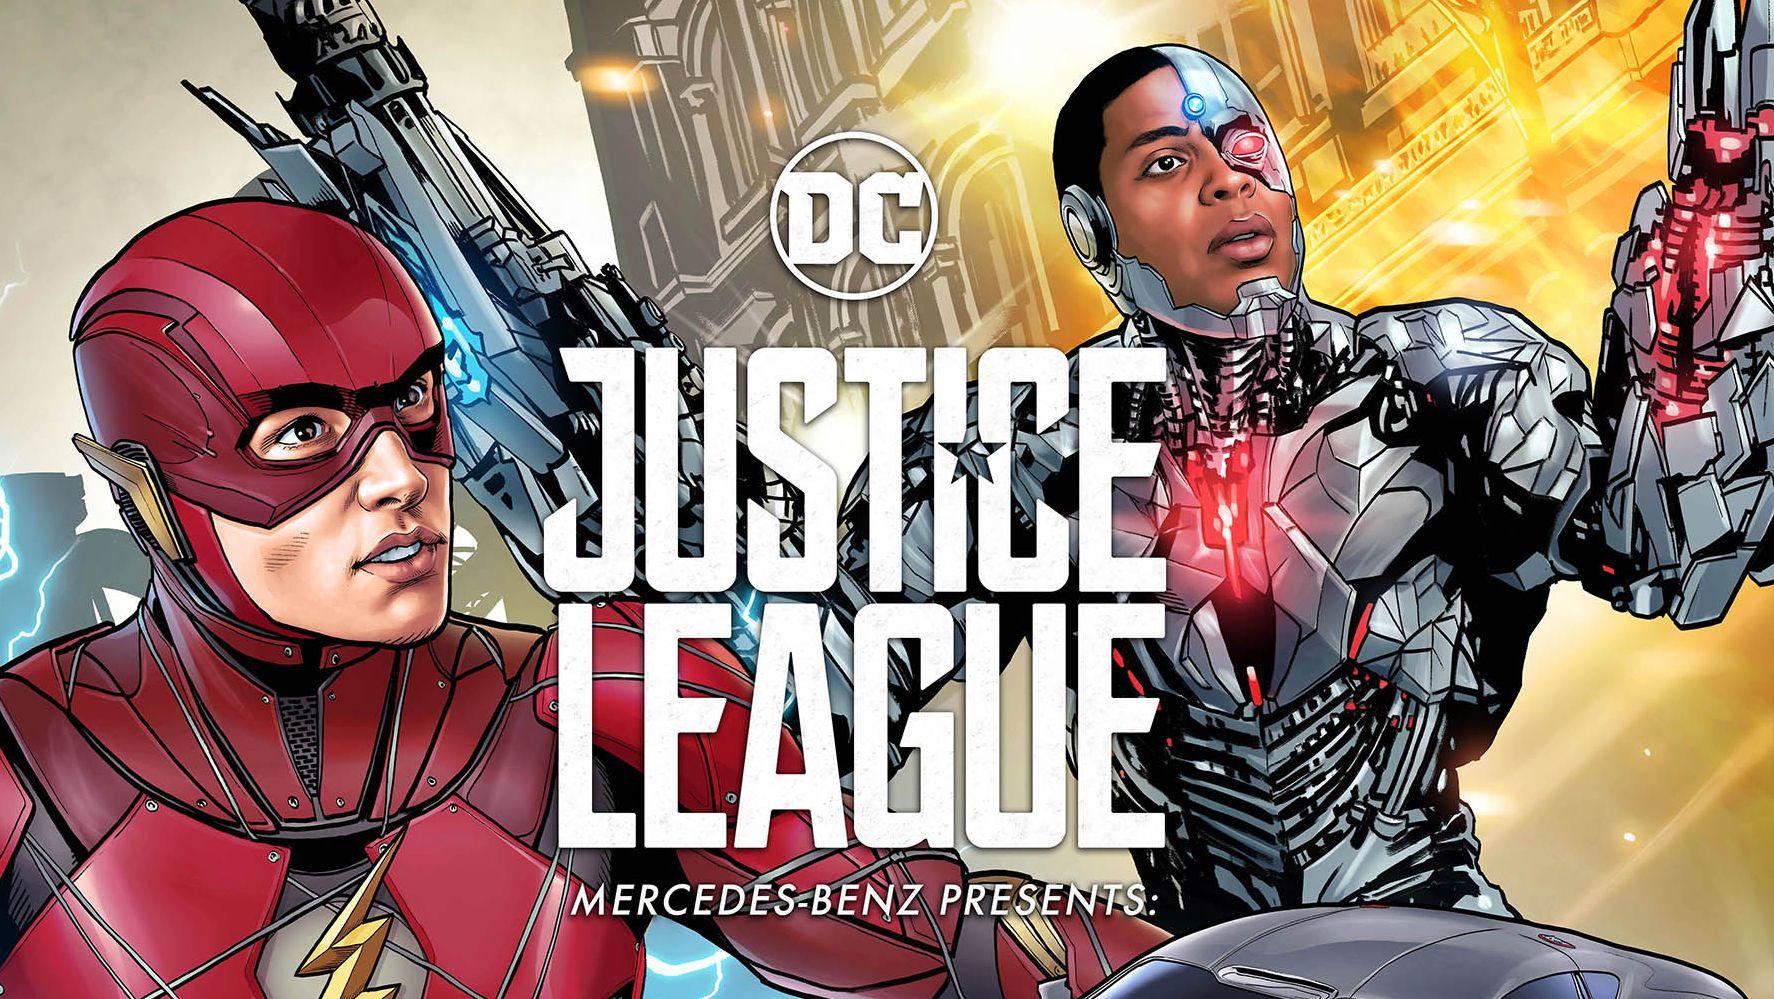 Justice league mercedes lockt superhelden fans mit for Justice league mercedes benz